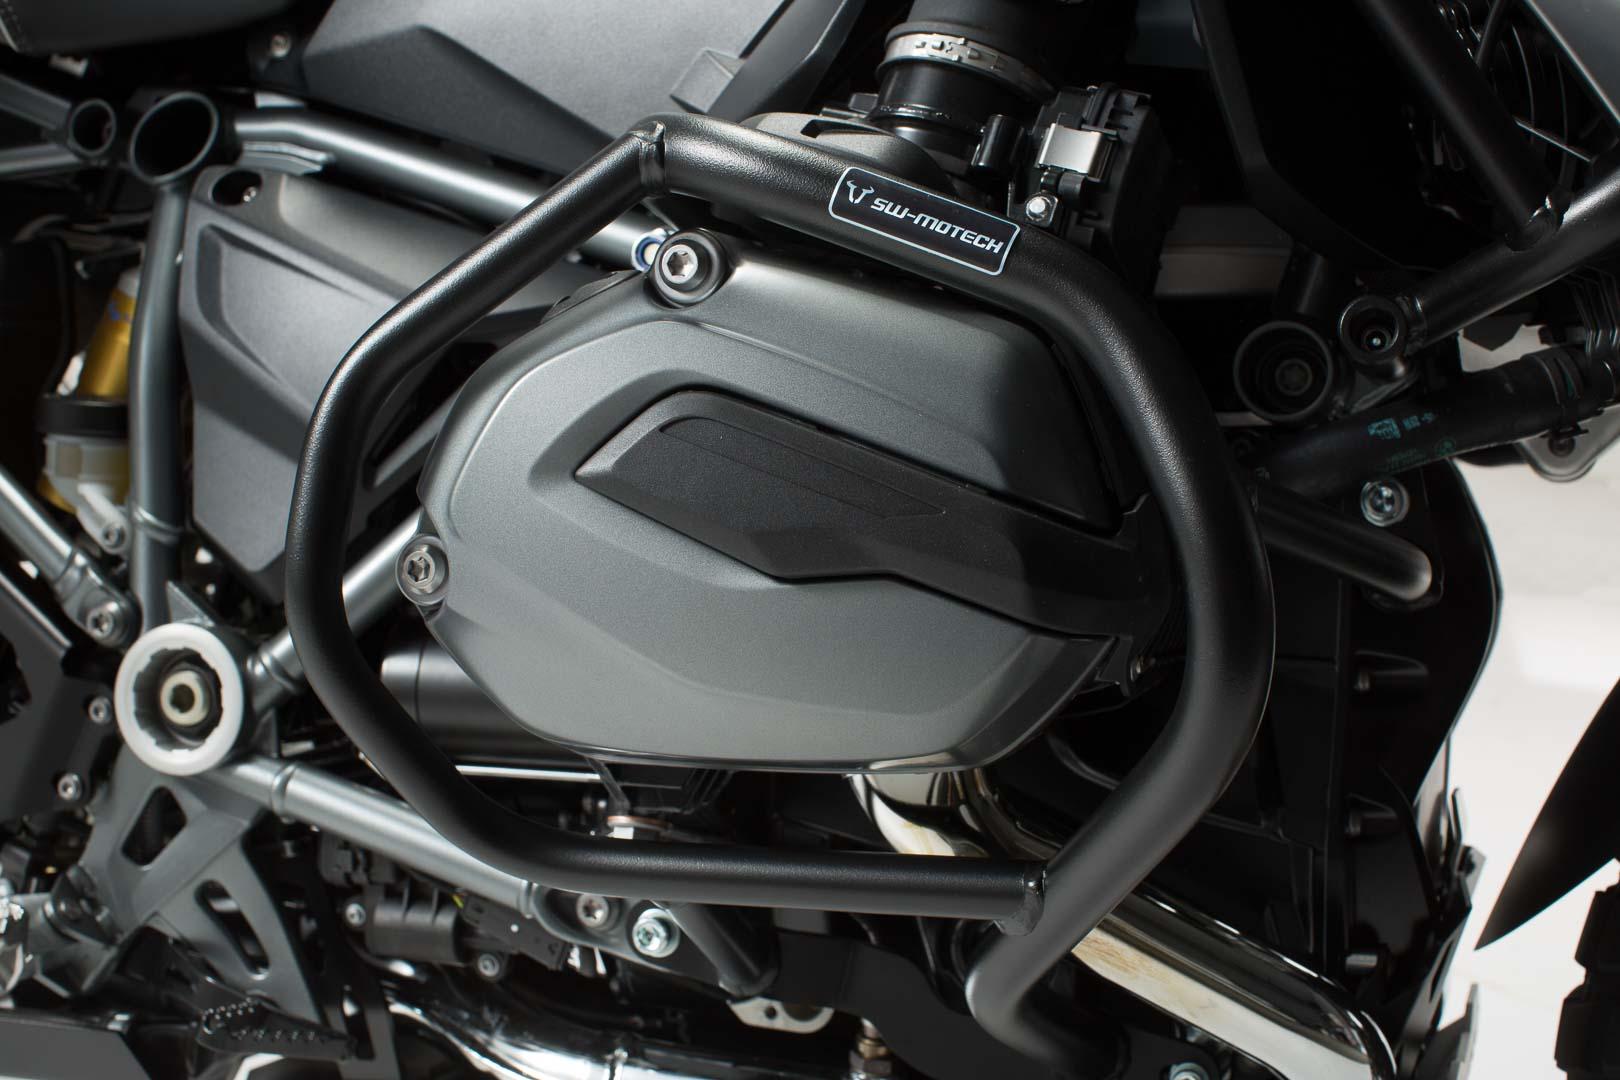 SW-Motech Moottorinsuojarauta BMW R1200GS 14-, musta